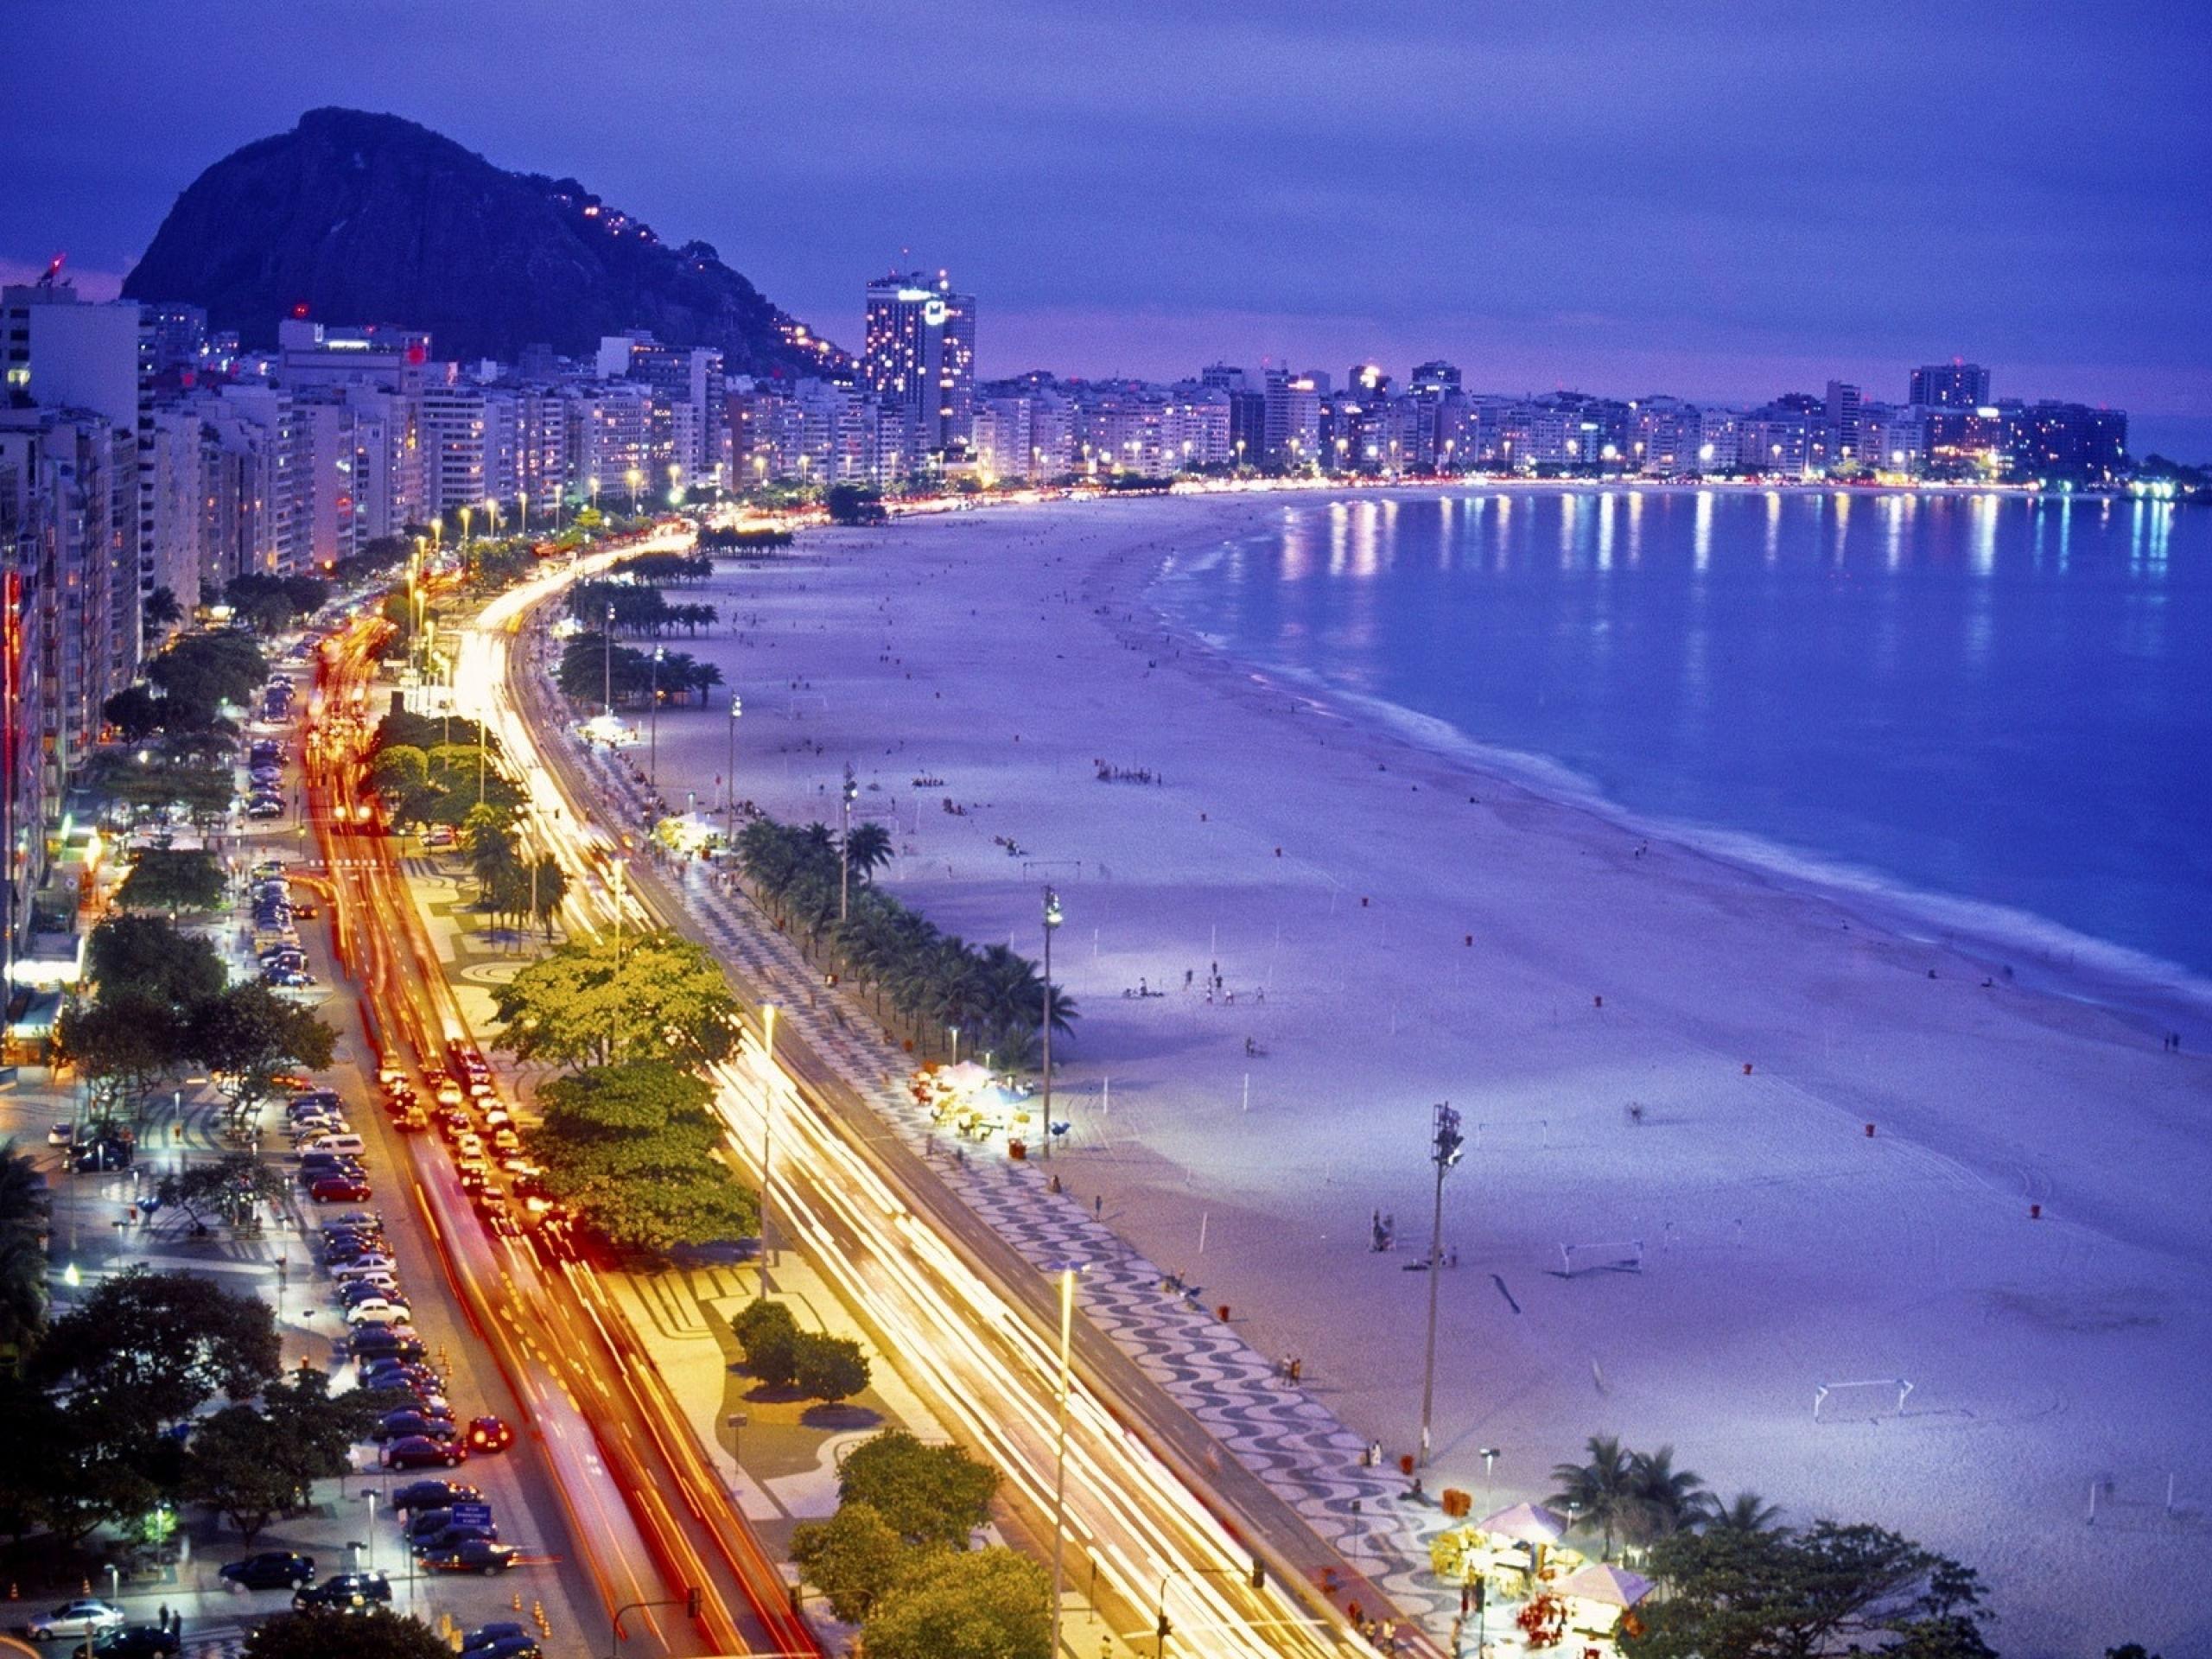 Hotel Augustos Copacabana